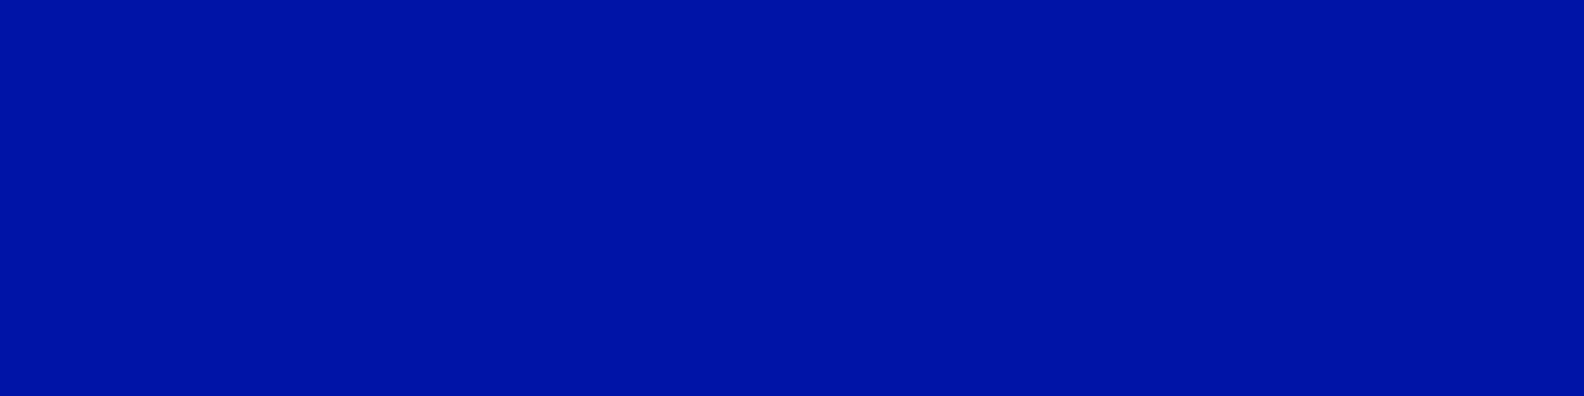 1584x396 Zaffre Solid Color Background